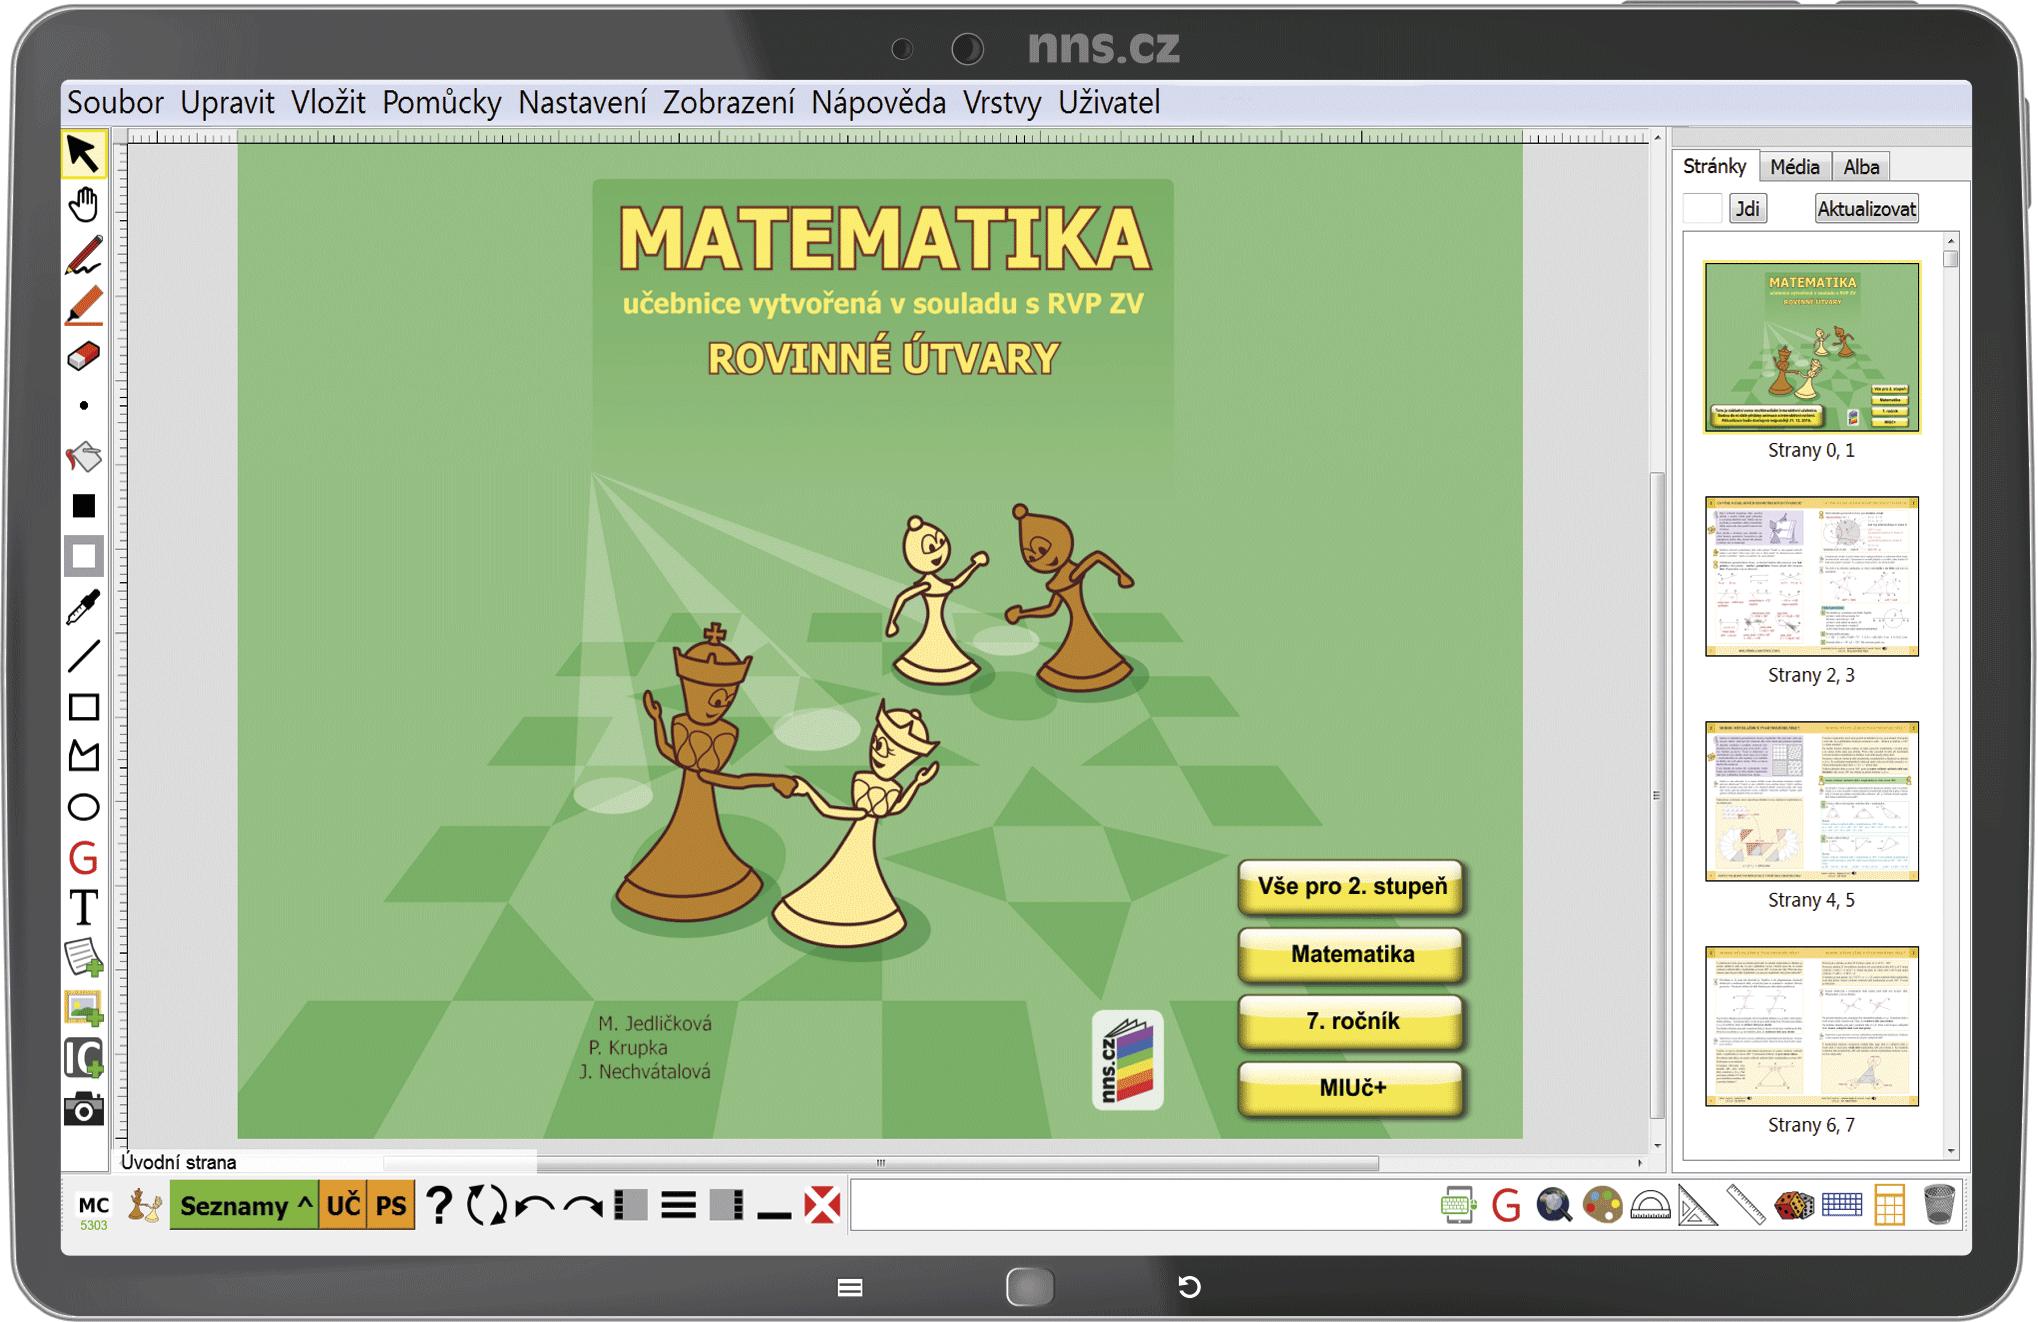 MIUč+ Matematika - Rovinné útvary – školní licence pro 1 učitele na 1 školní rok